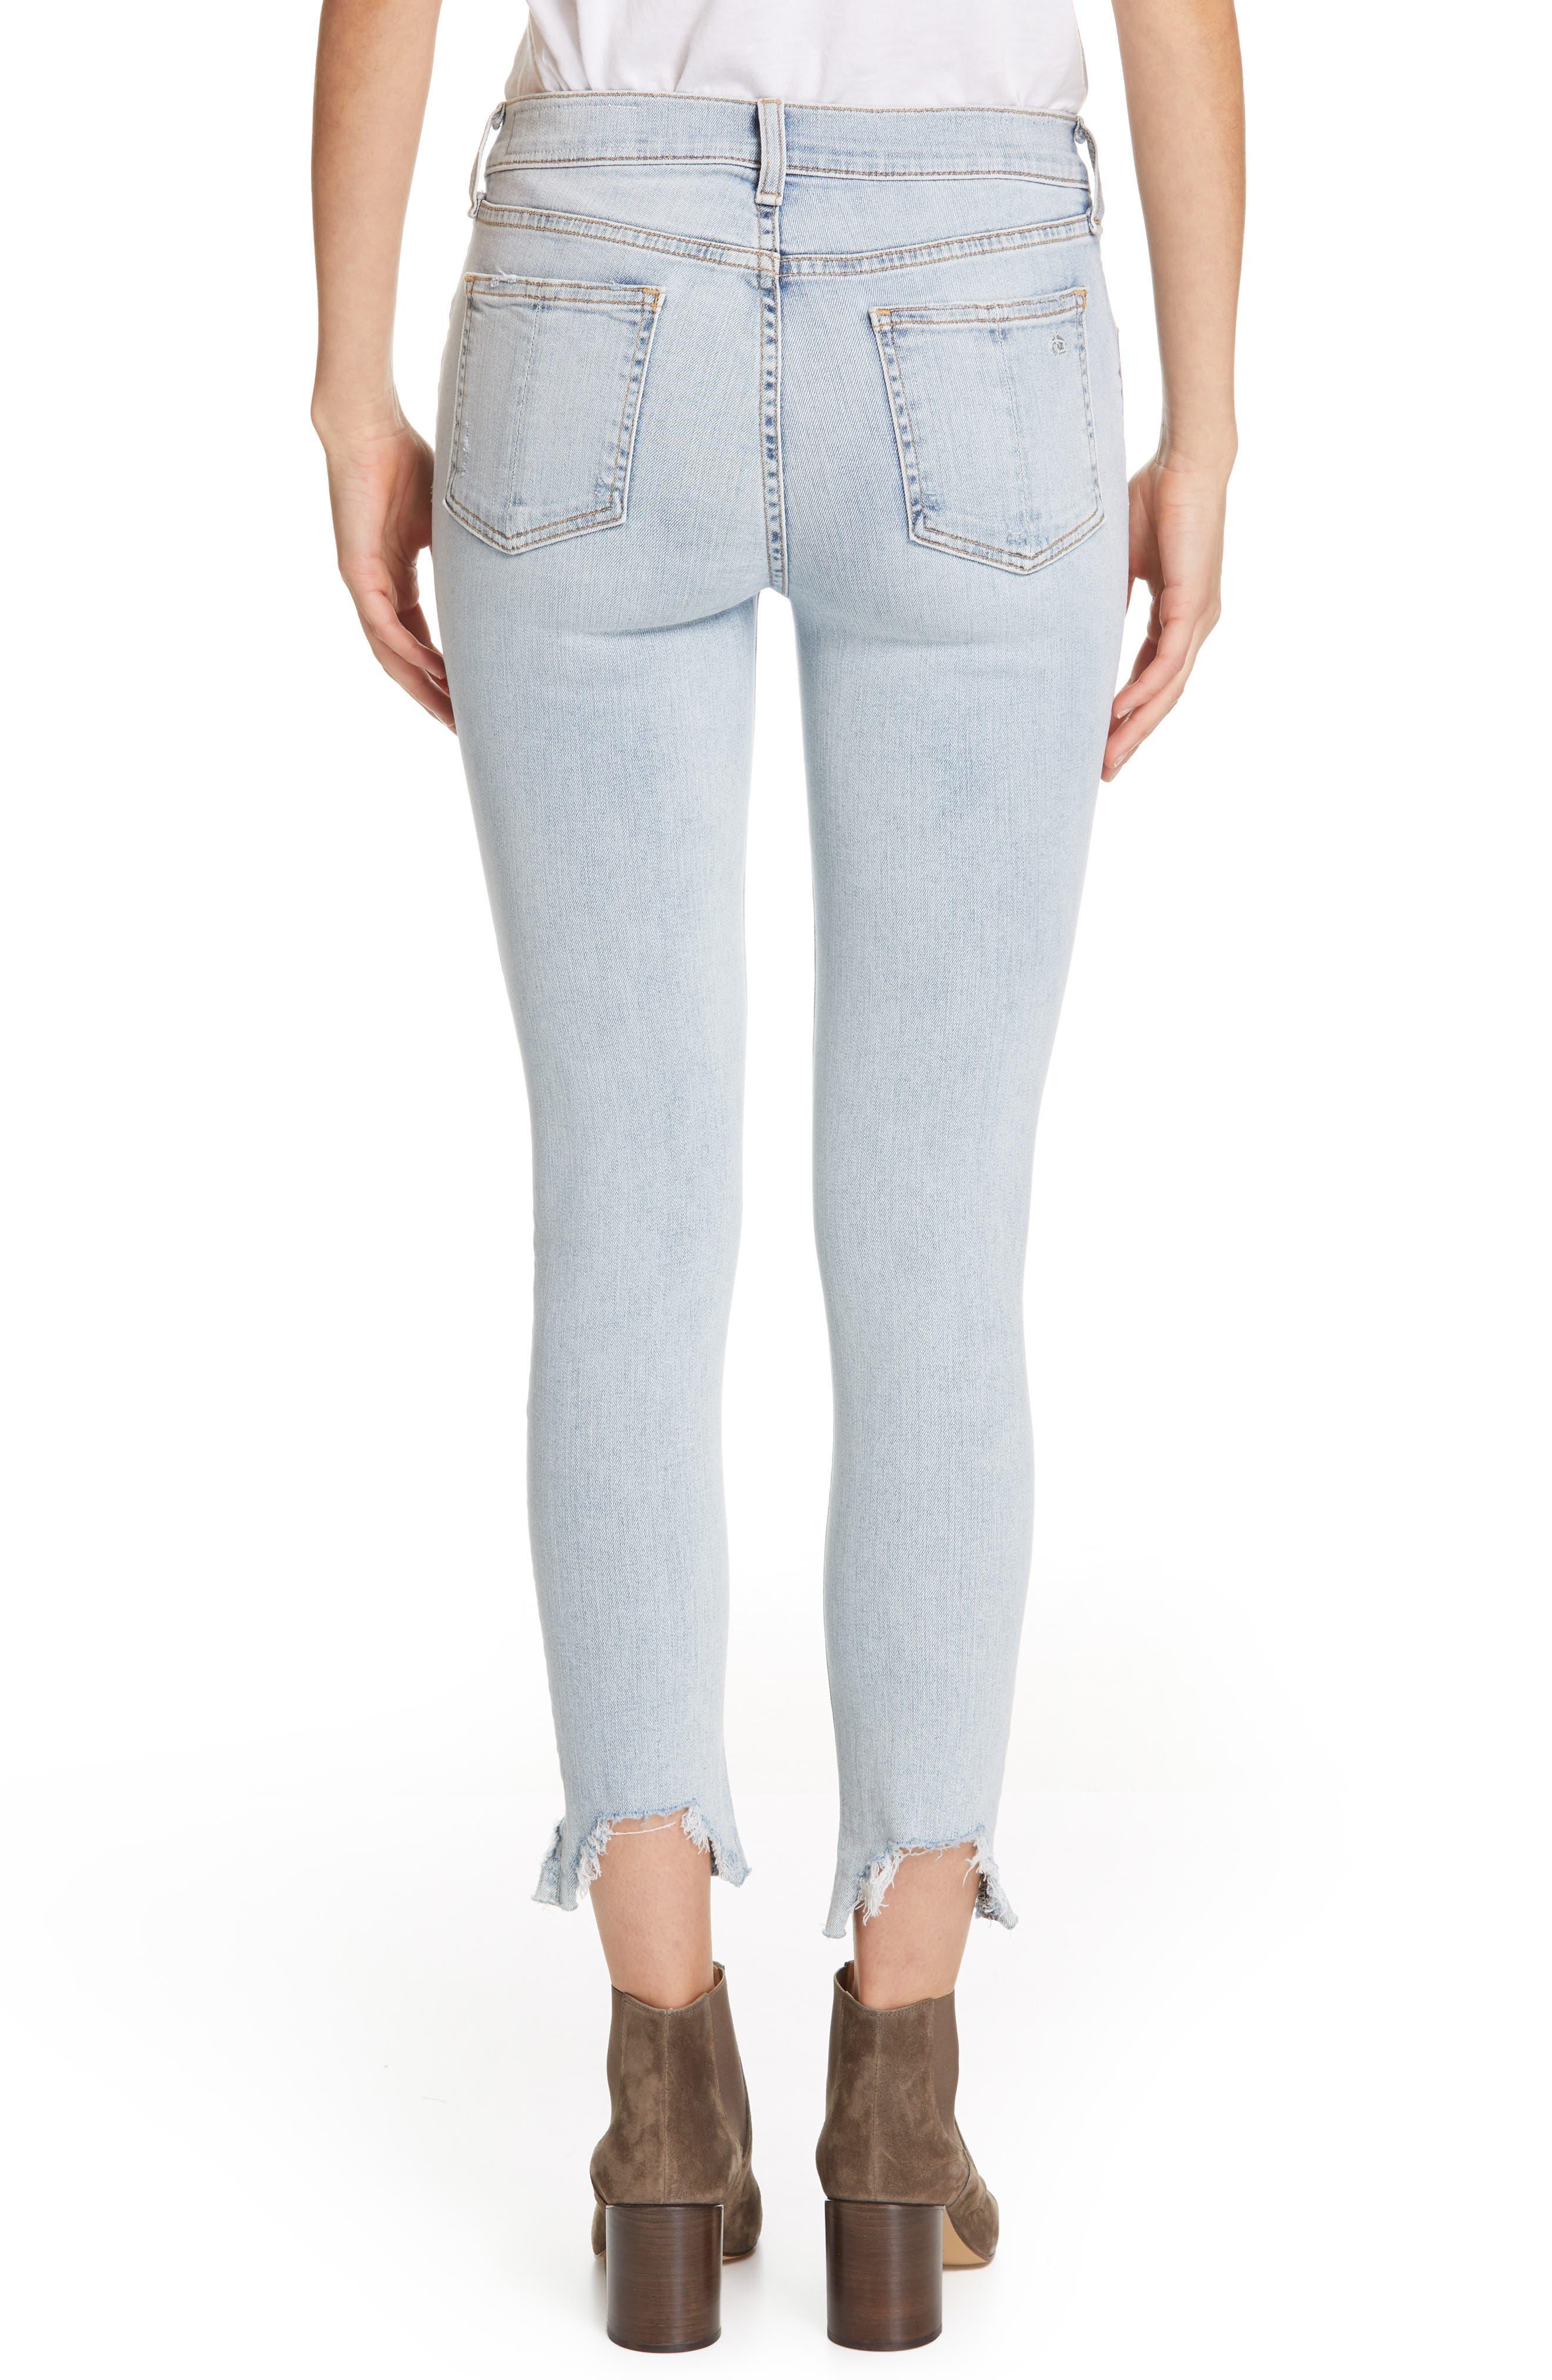 RAG & BONE,                             JEAN Ripped Ankle Skinny Jeans,                             Alternate thumbnail 2, color,                             LYNN W HOLES